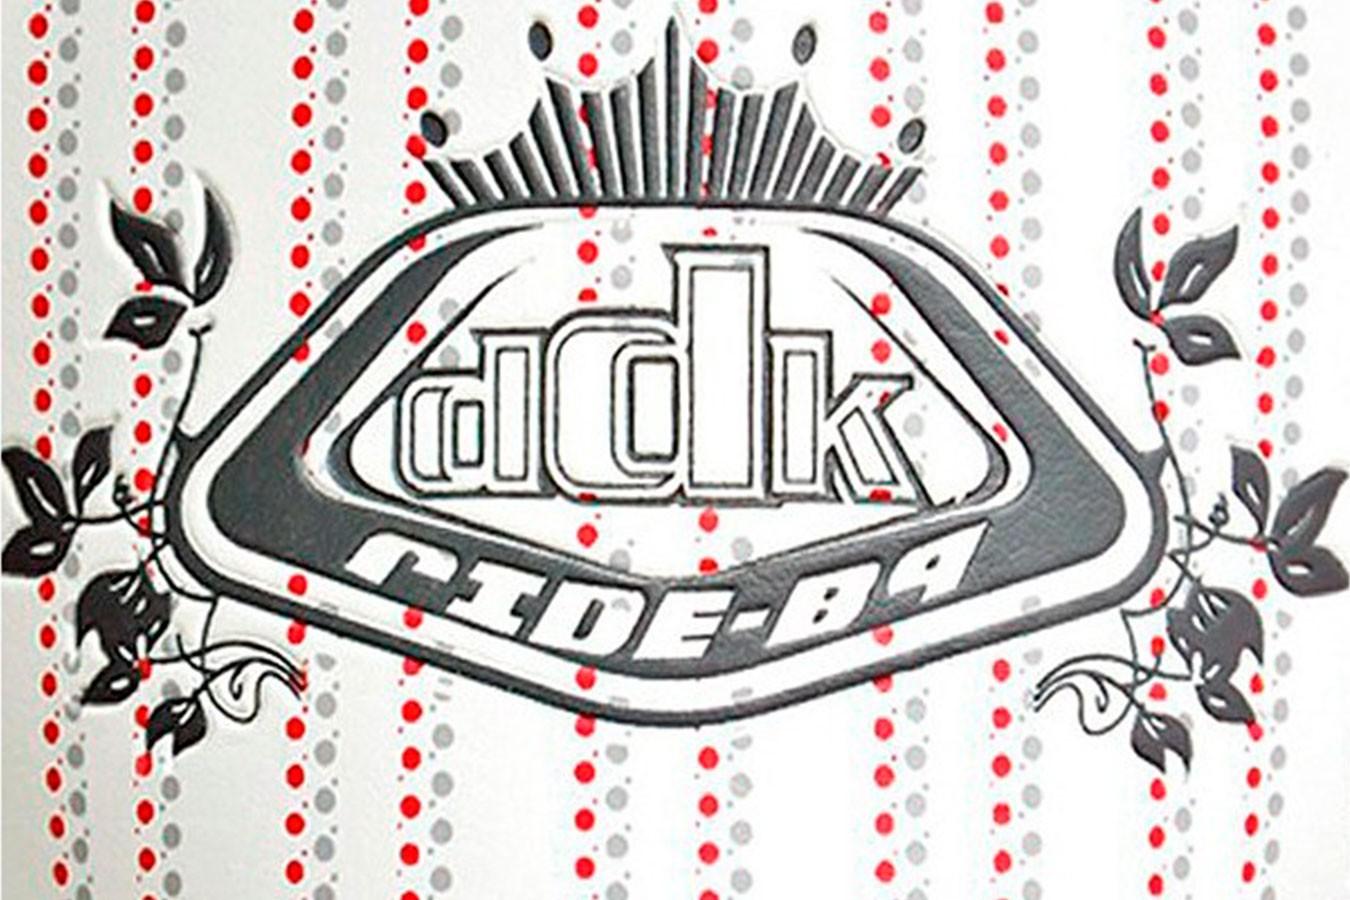 Selim BMX DDK 248 RIDE B9